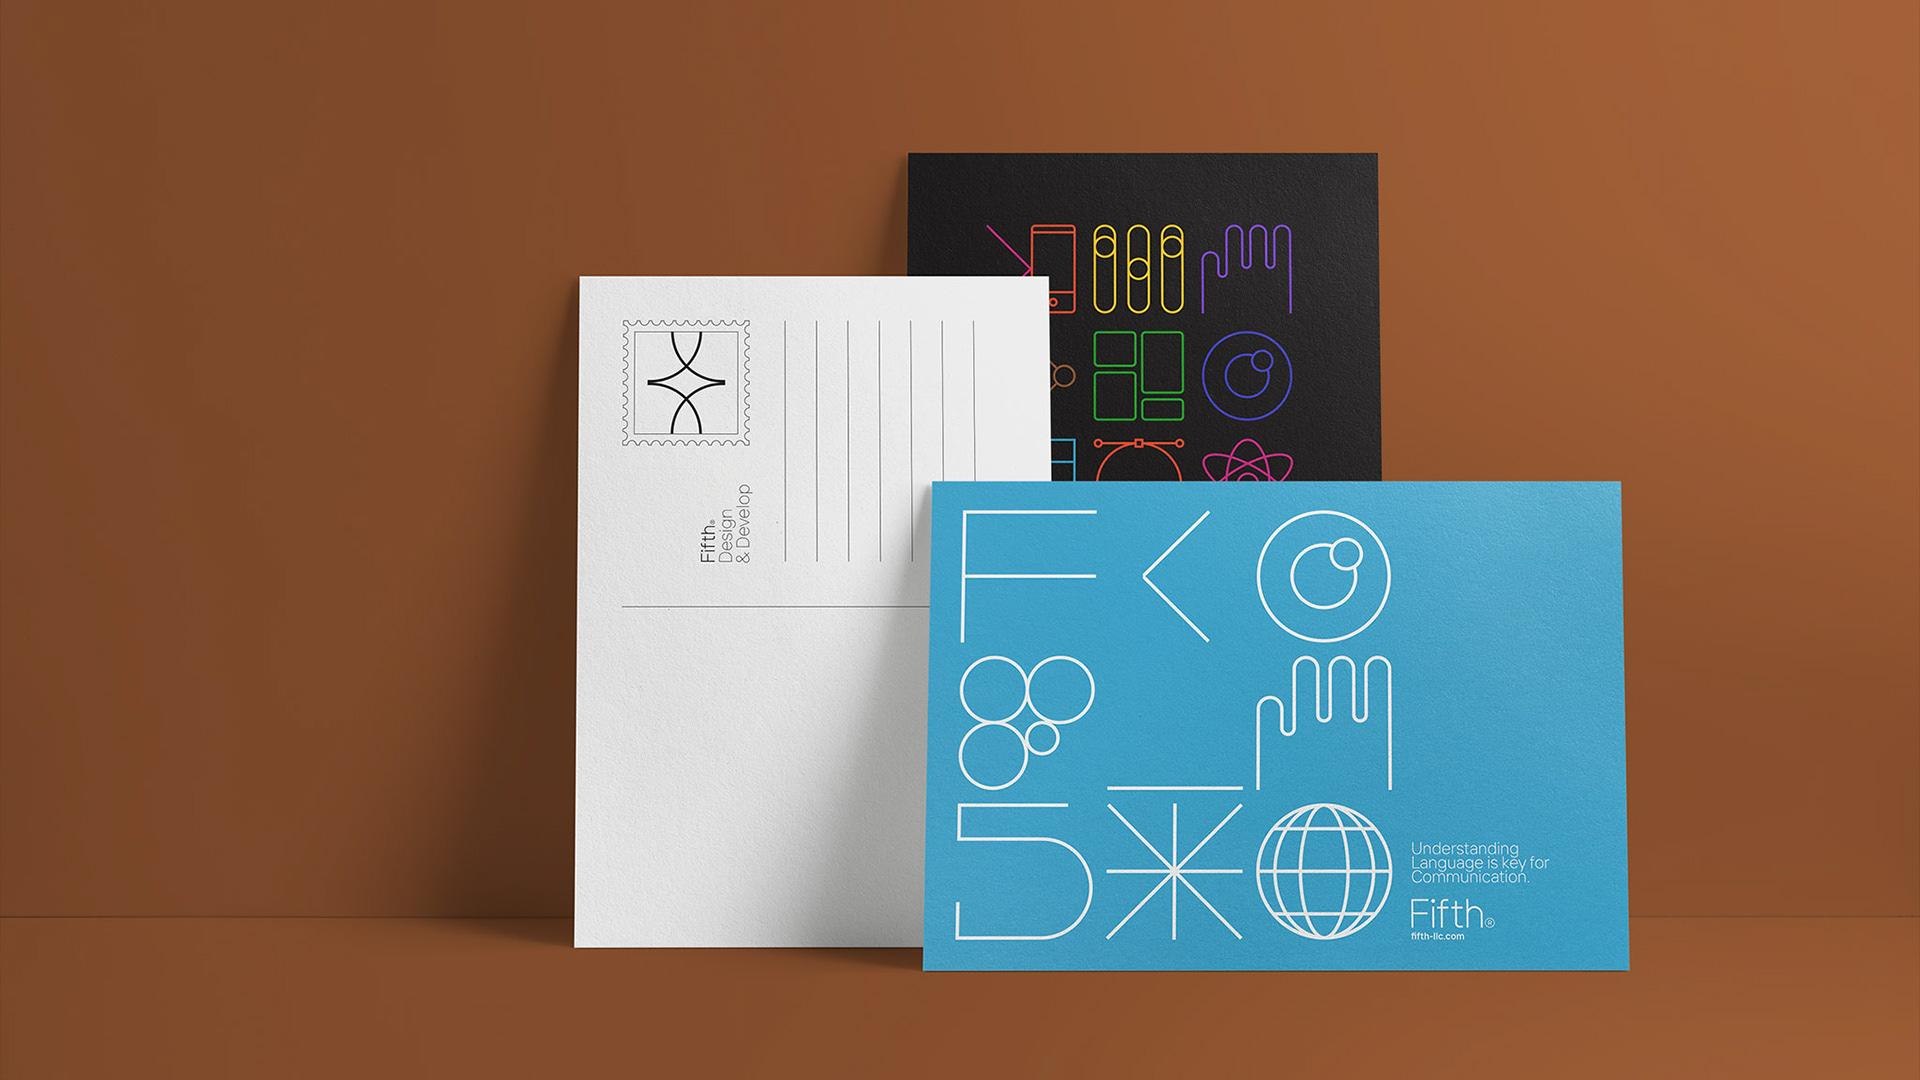 Fifth设计和软件开发公司品牌VI设计